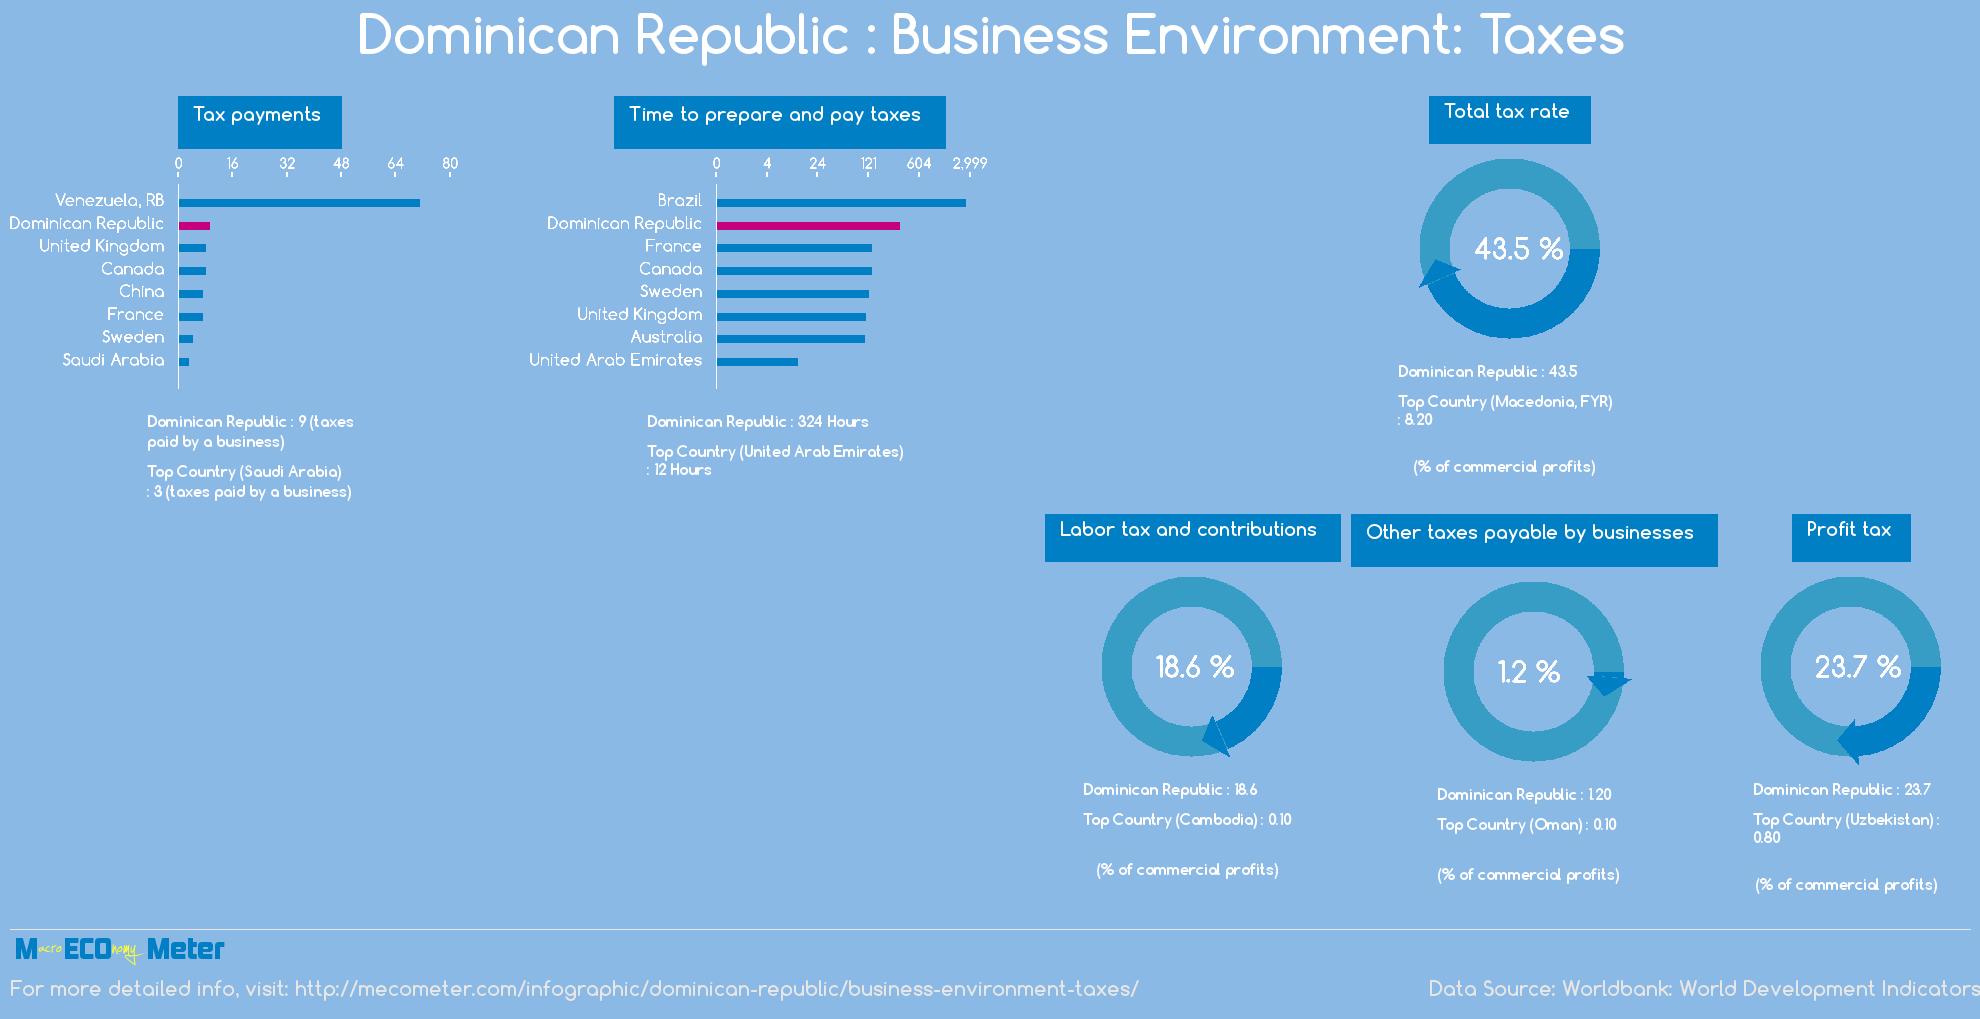 Dominican Republic : Business Environment: Taxes